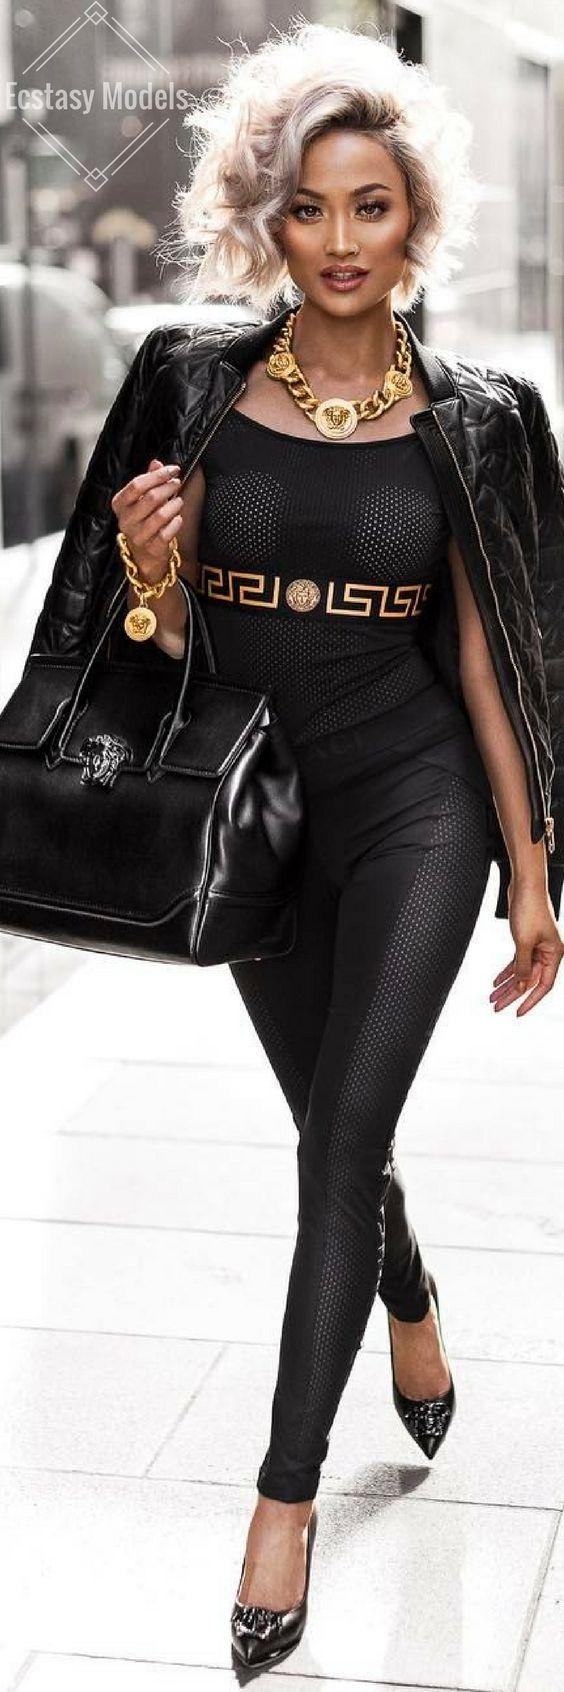 Versace Slay // Fashion Look by Micah Gianneli